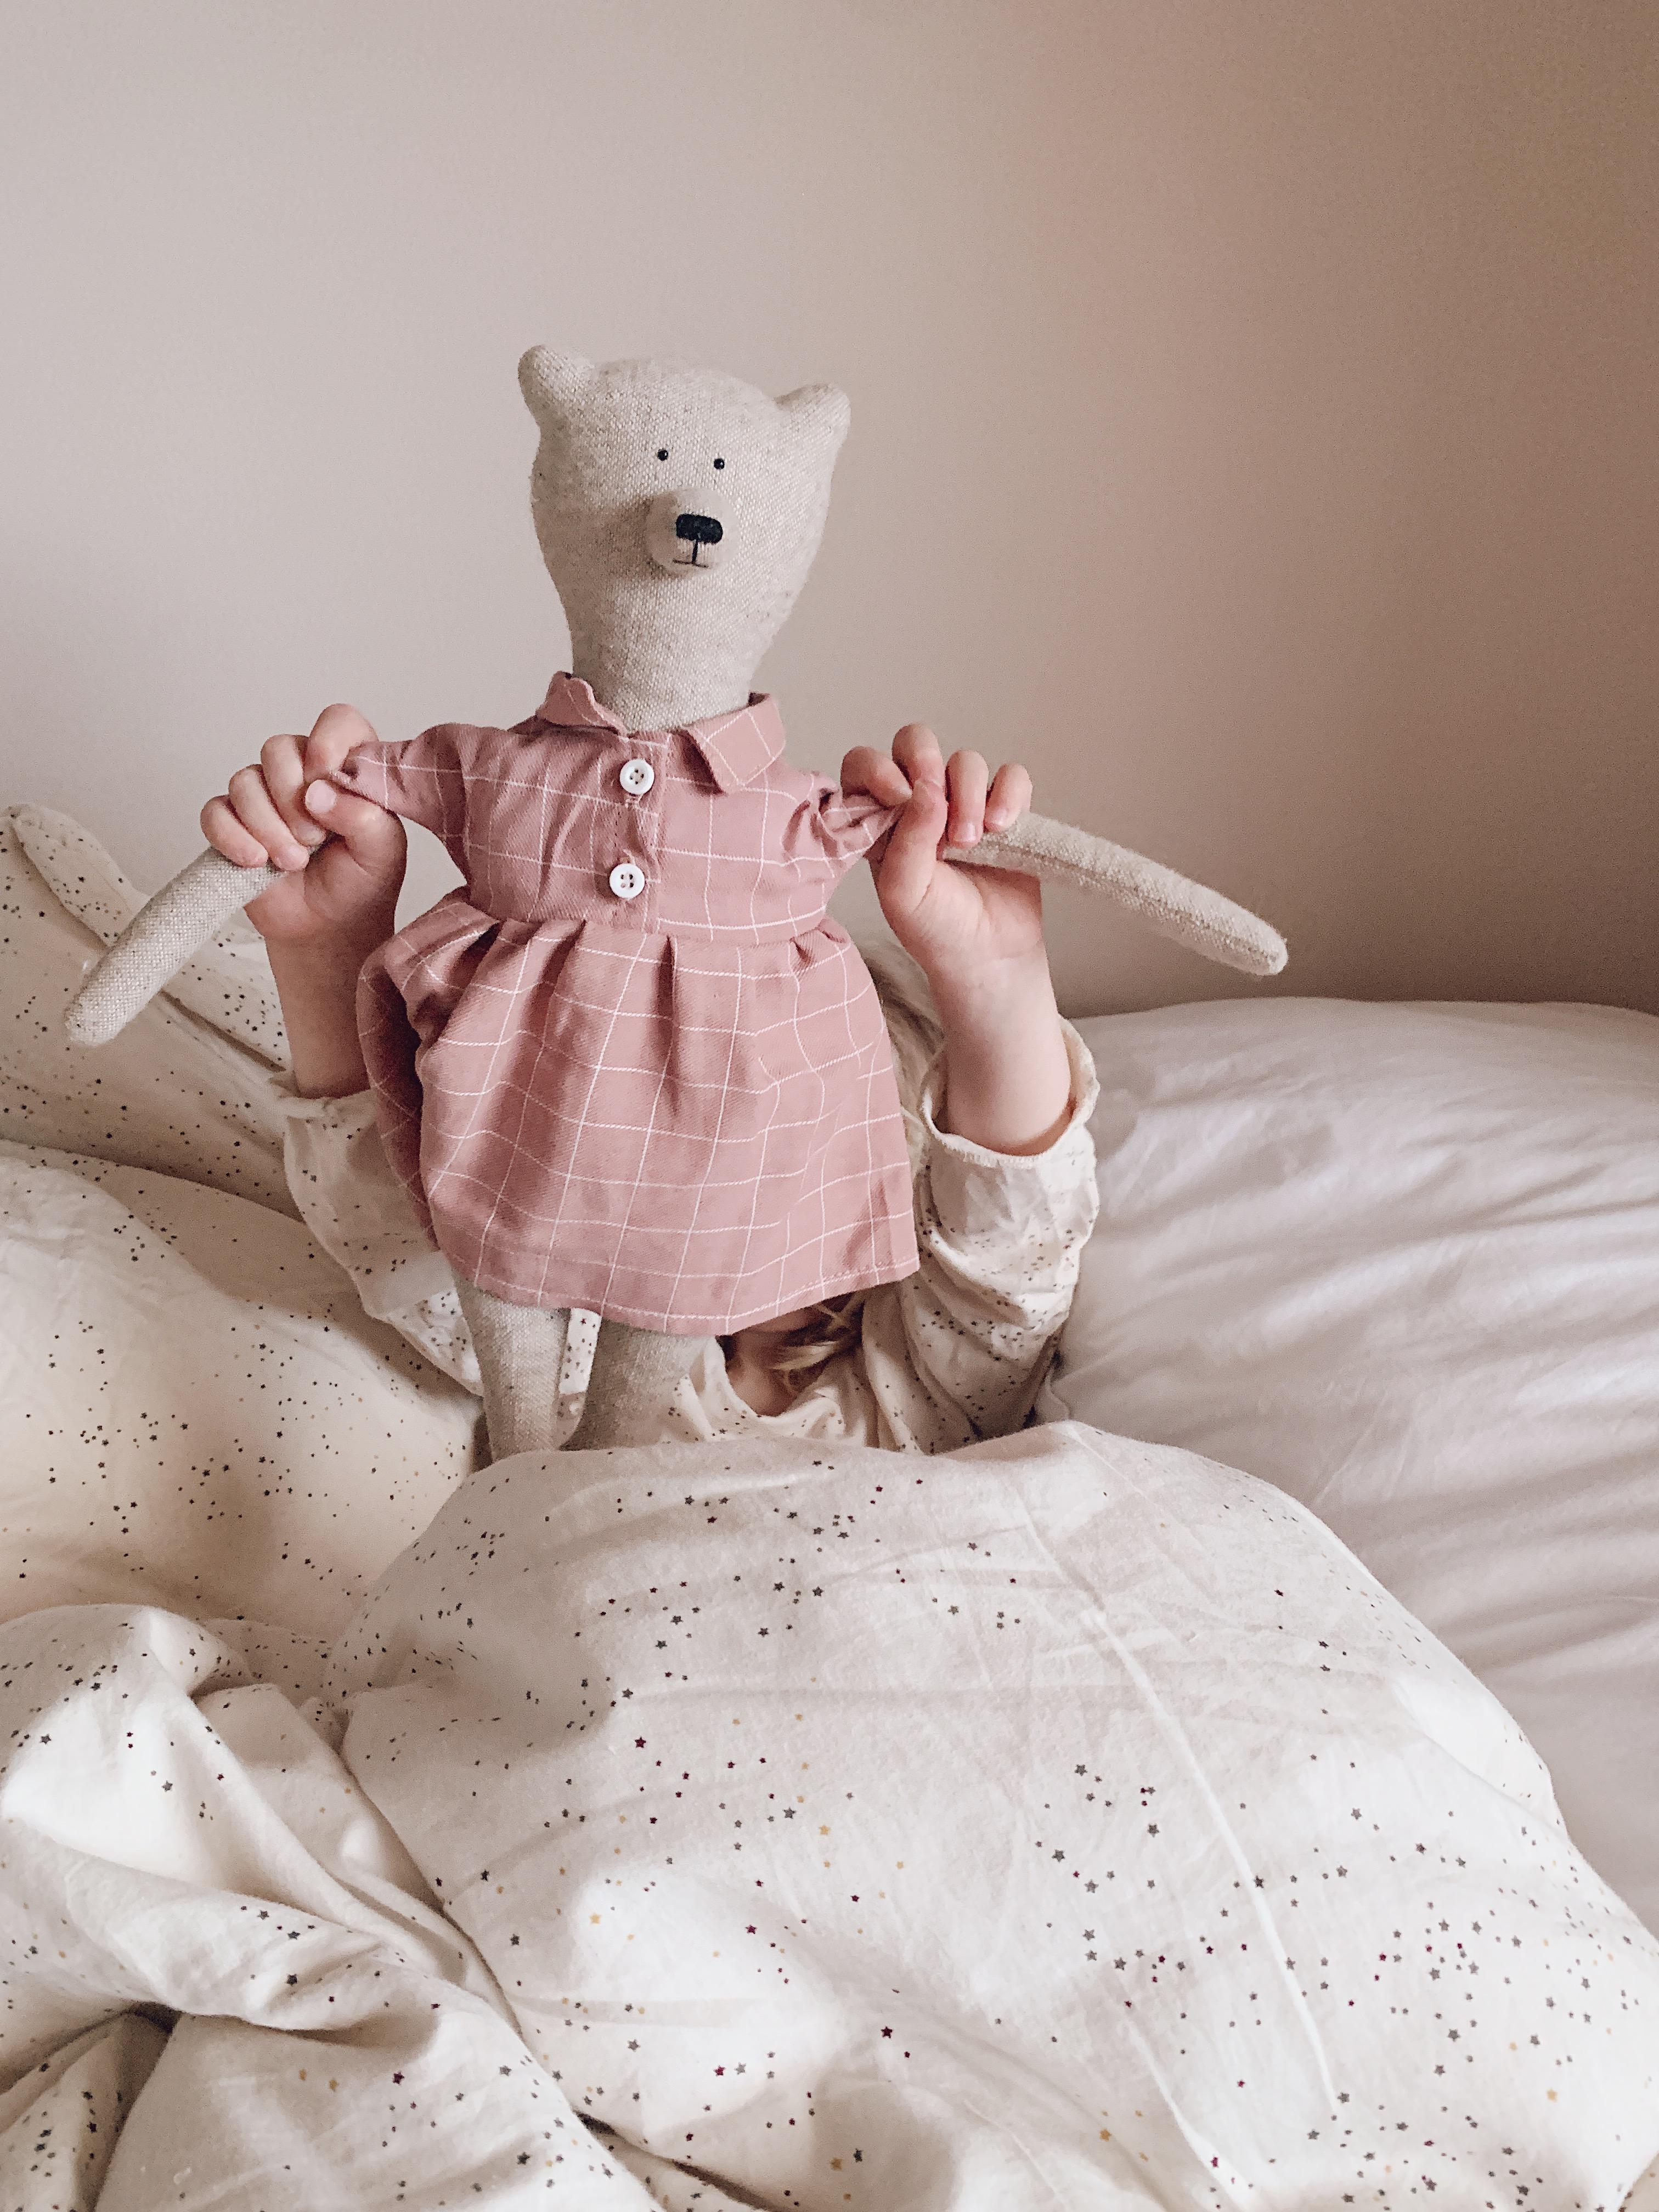 Philomena Kloss bamse med rosa rutet kjole